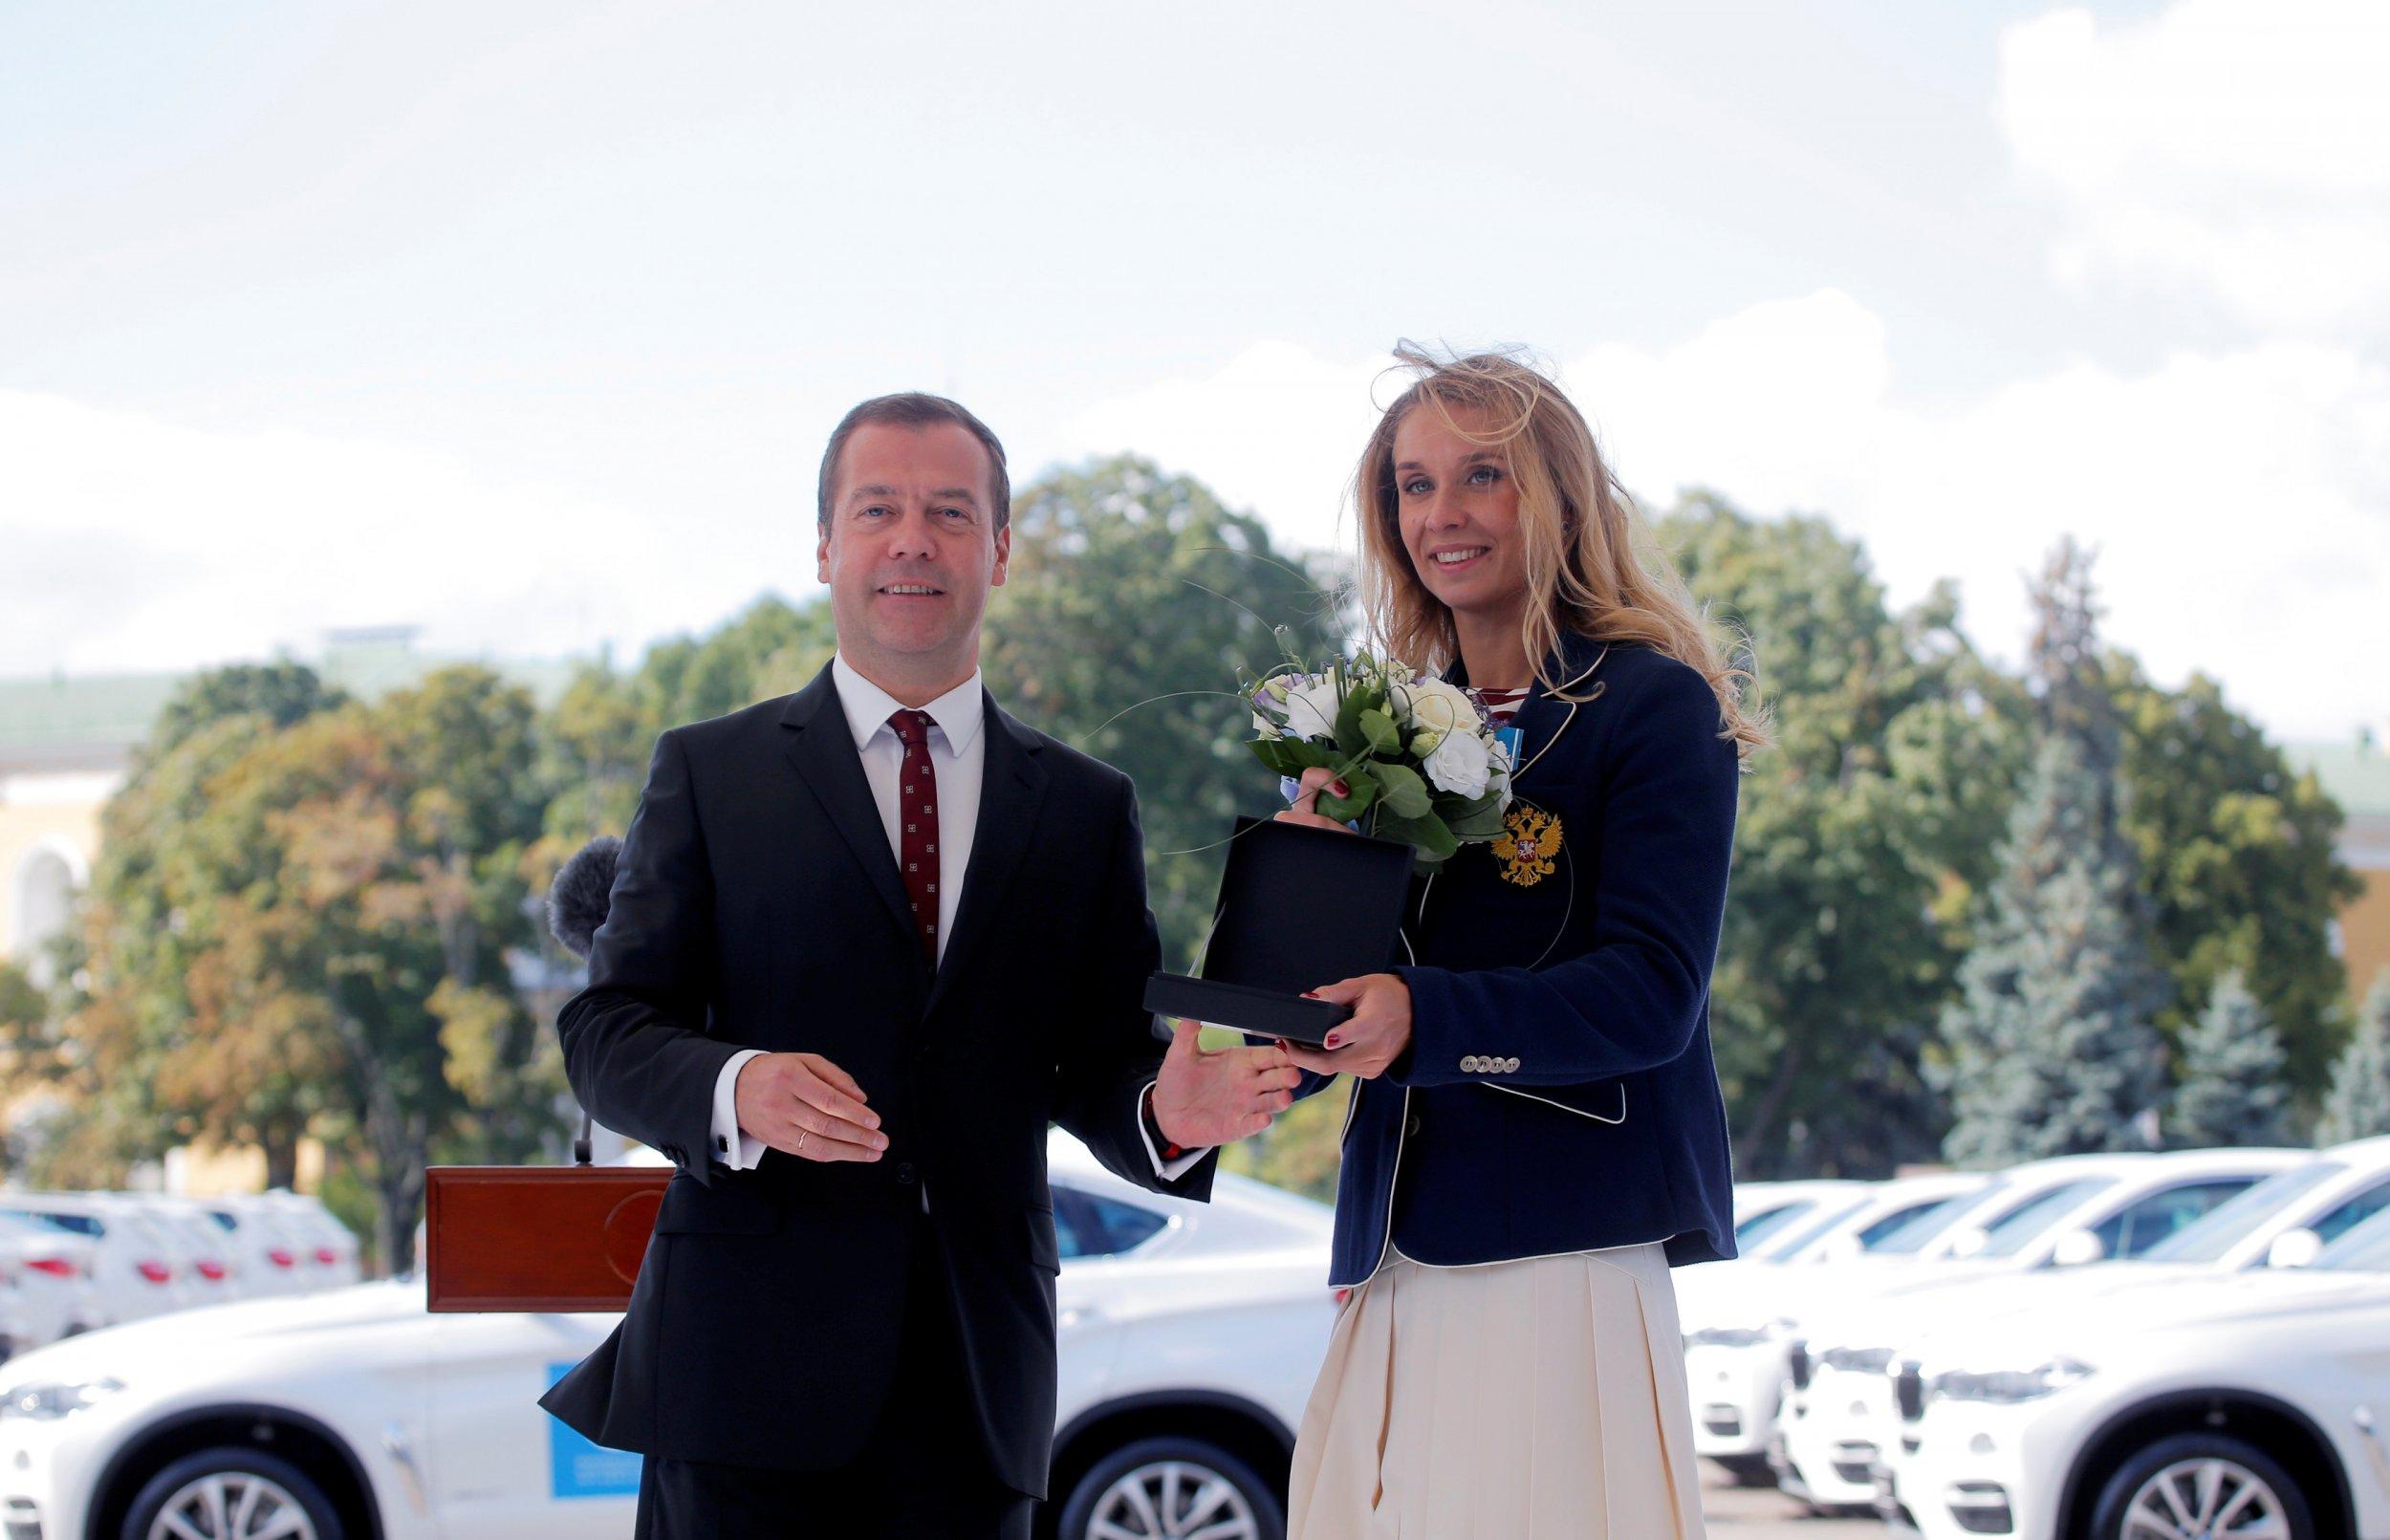 Dmitry Medvedev and Natalia Ischenk